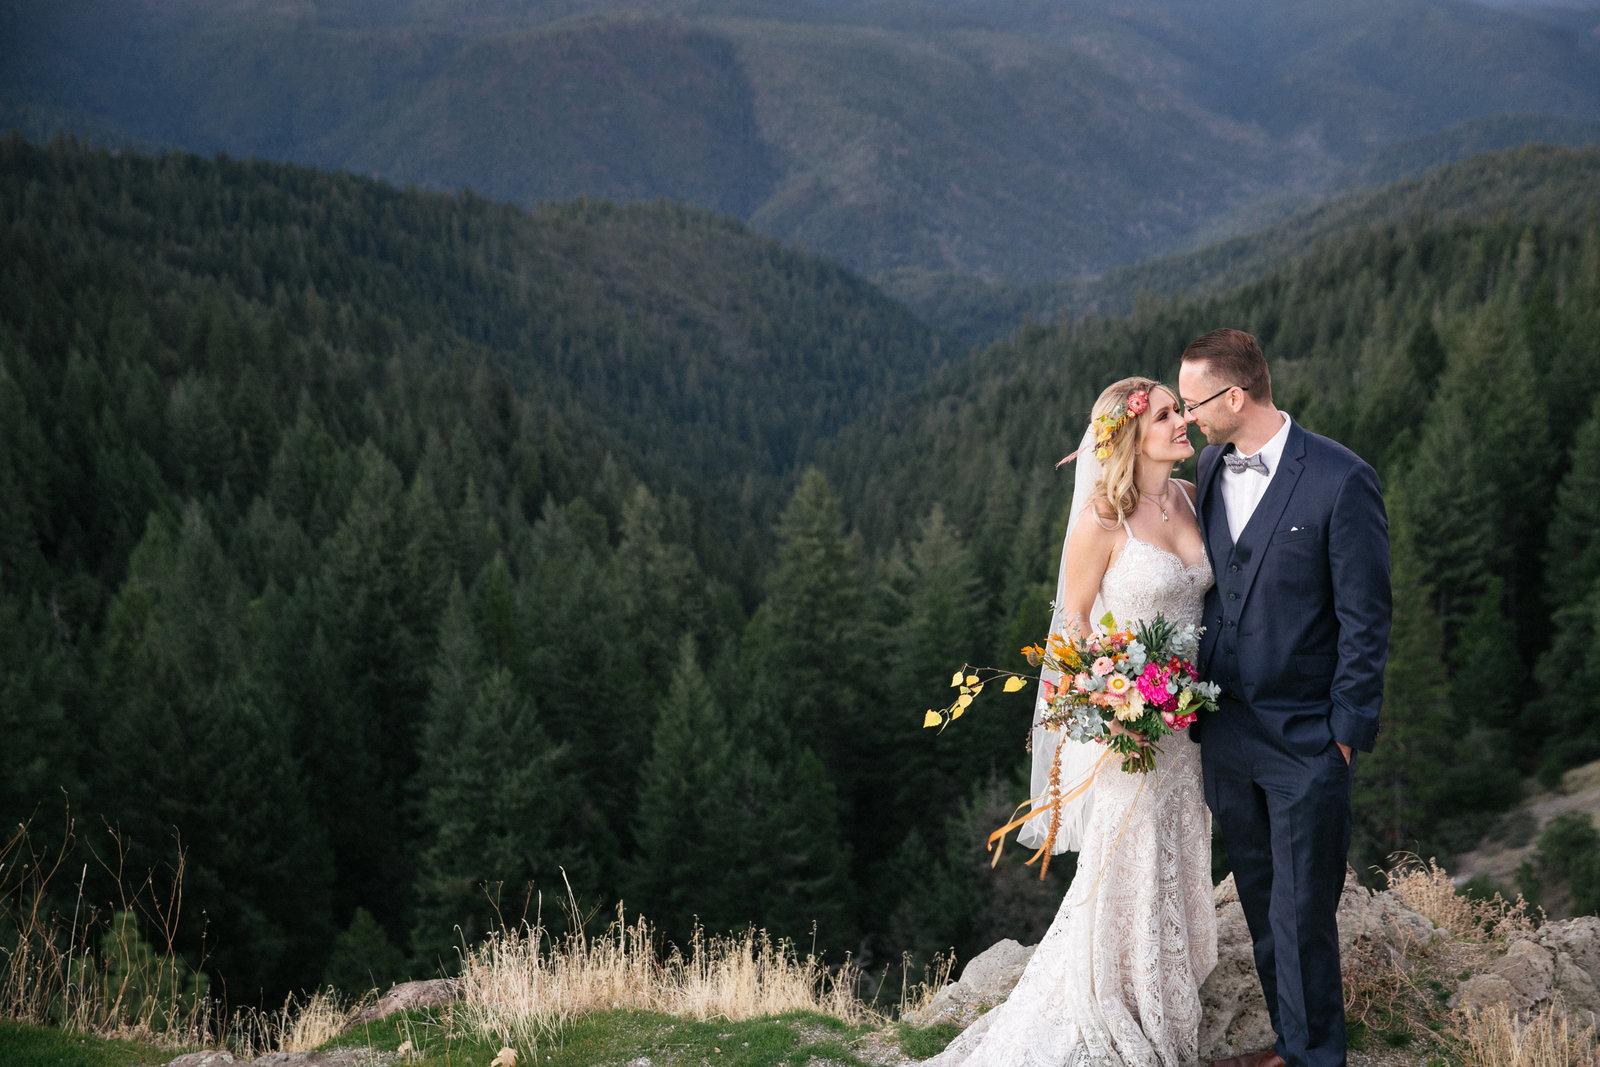 Corinne grassini wedding